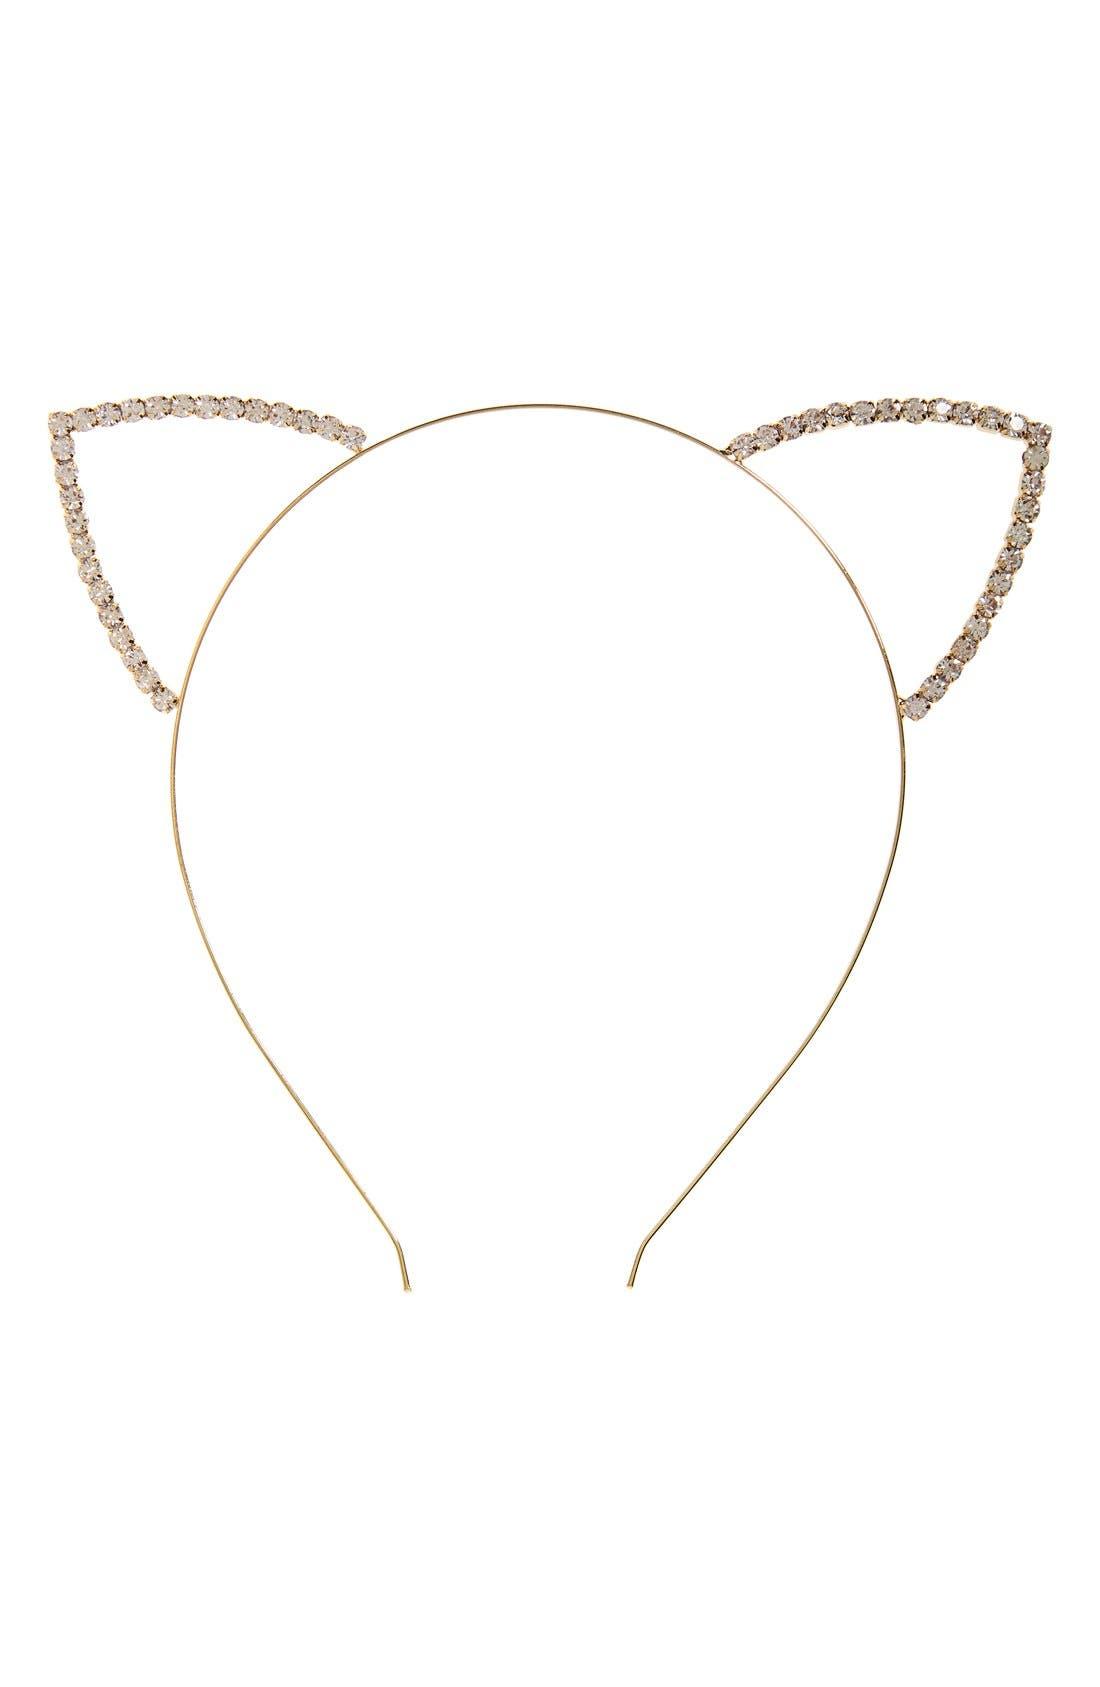 Alternate Image 1 Selected - Cara 'Meow' Crystal Cat Ear Headband